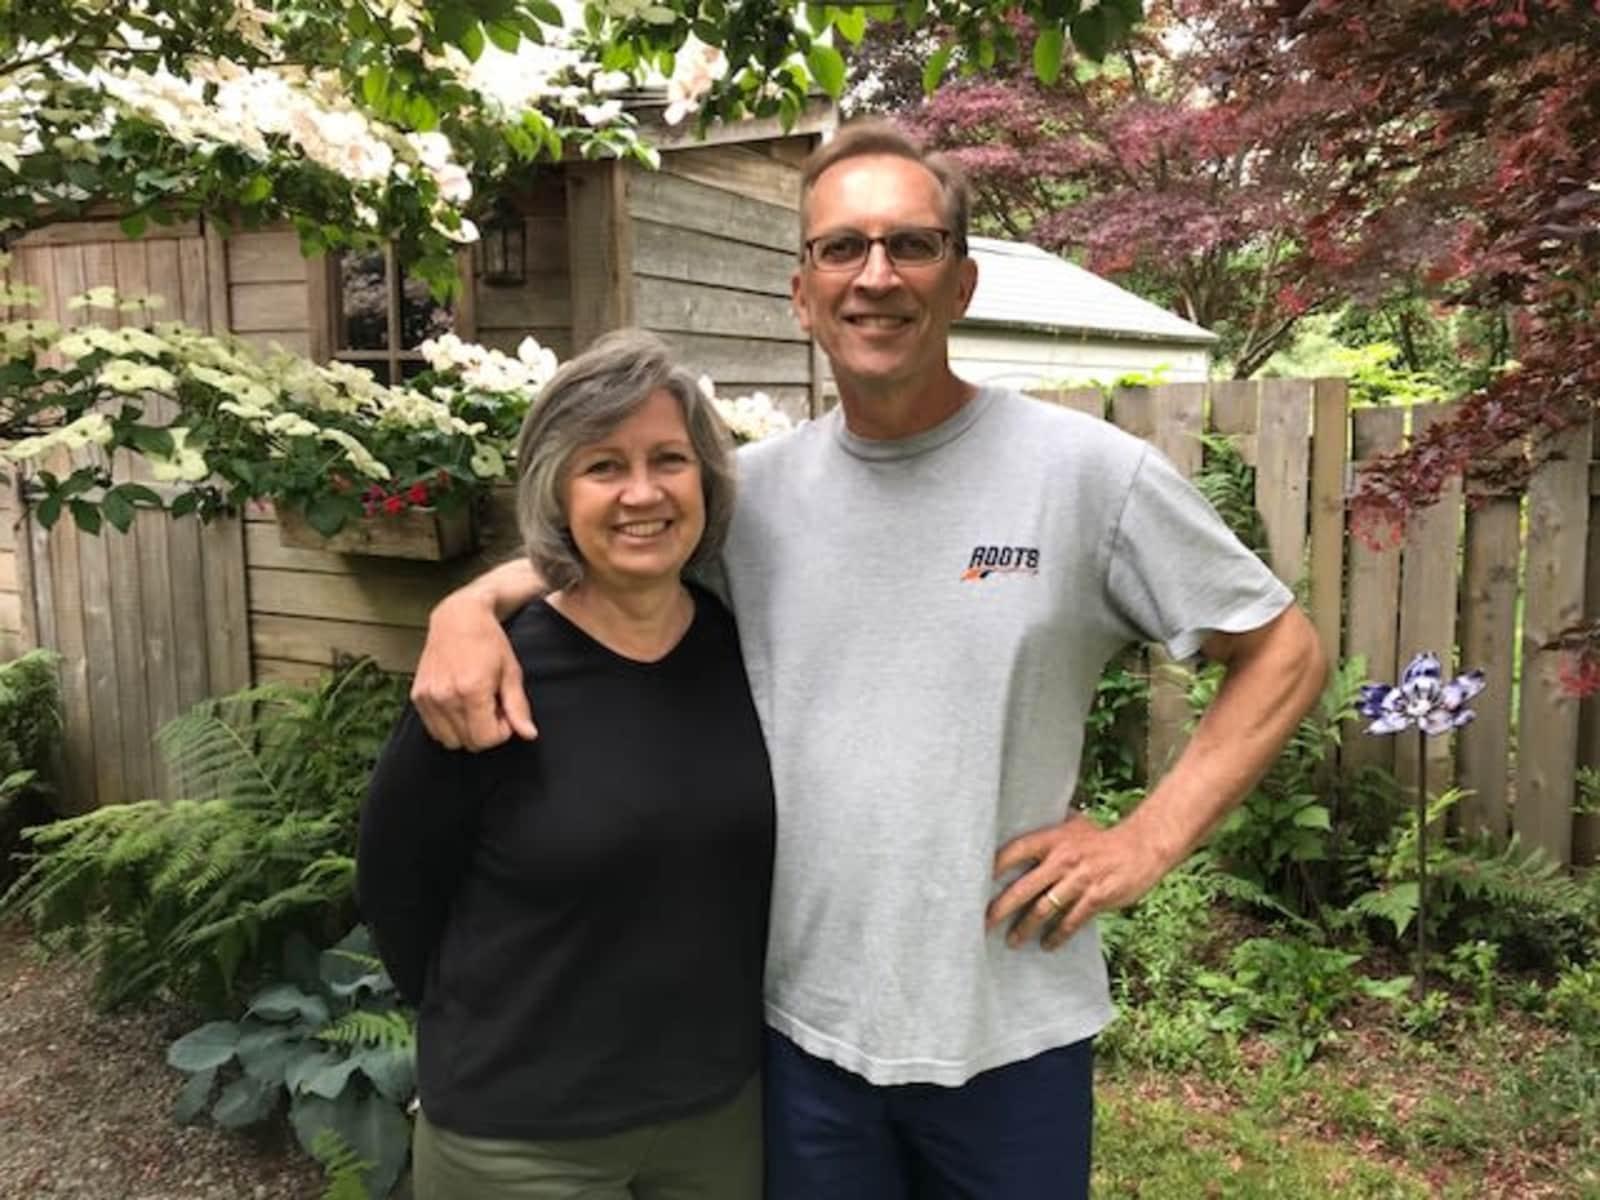 Tyrus & Jane from Penticton, British Columbia, Canada